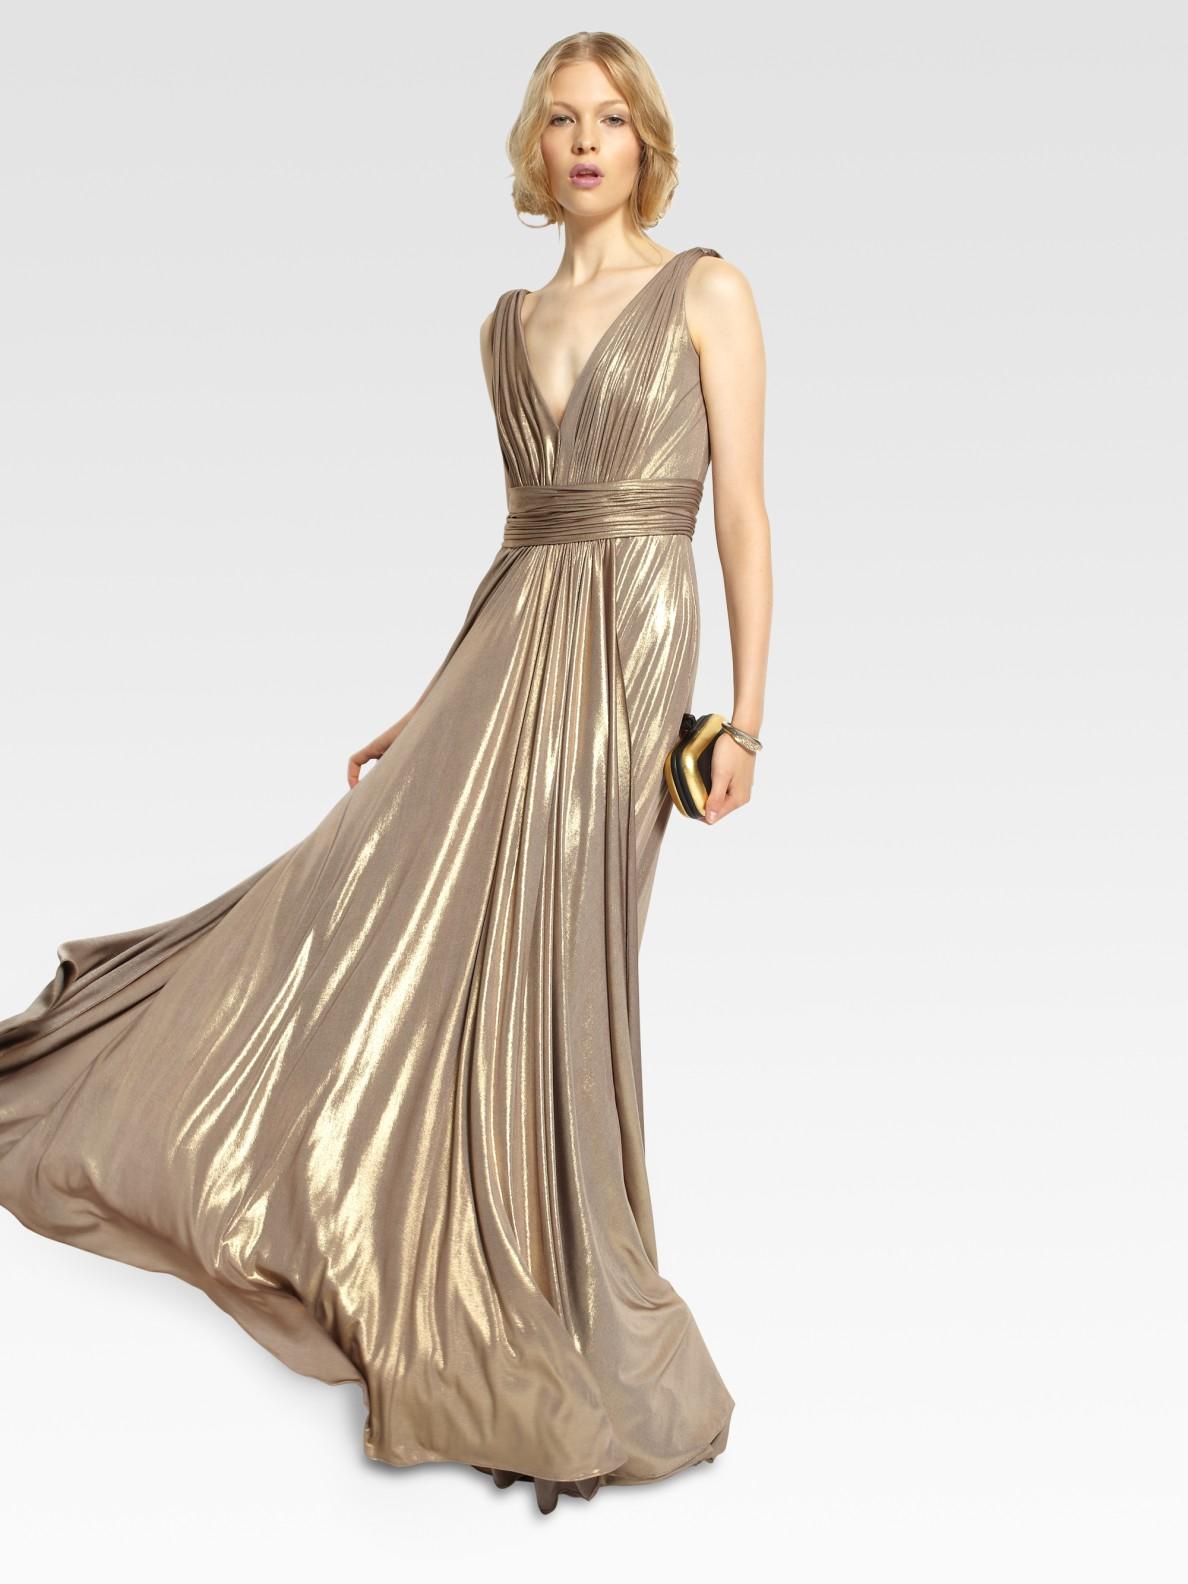 Lyst - Notte By Marchesa Metallic Gown in Metallic